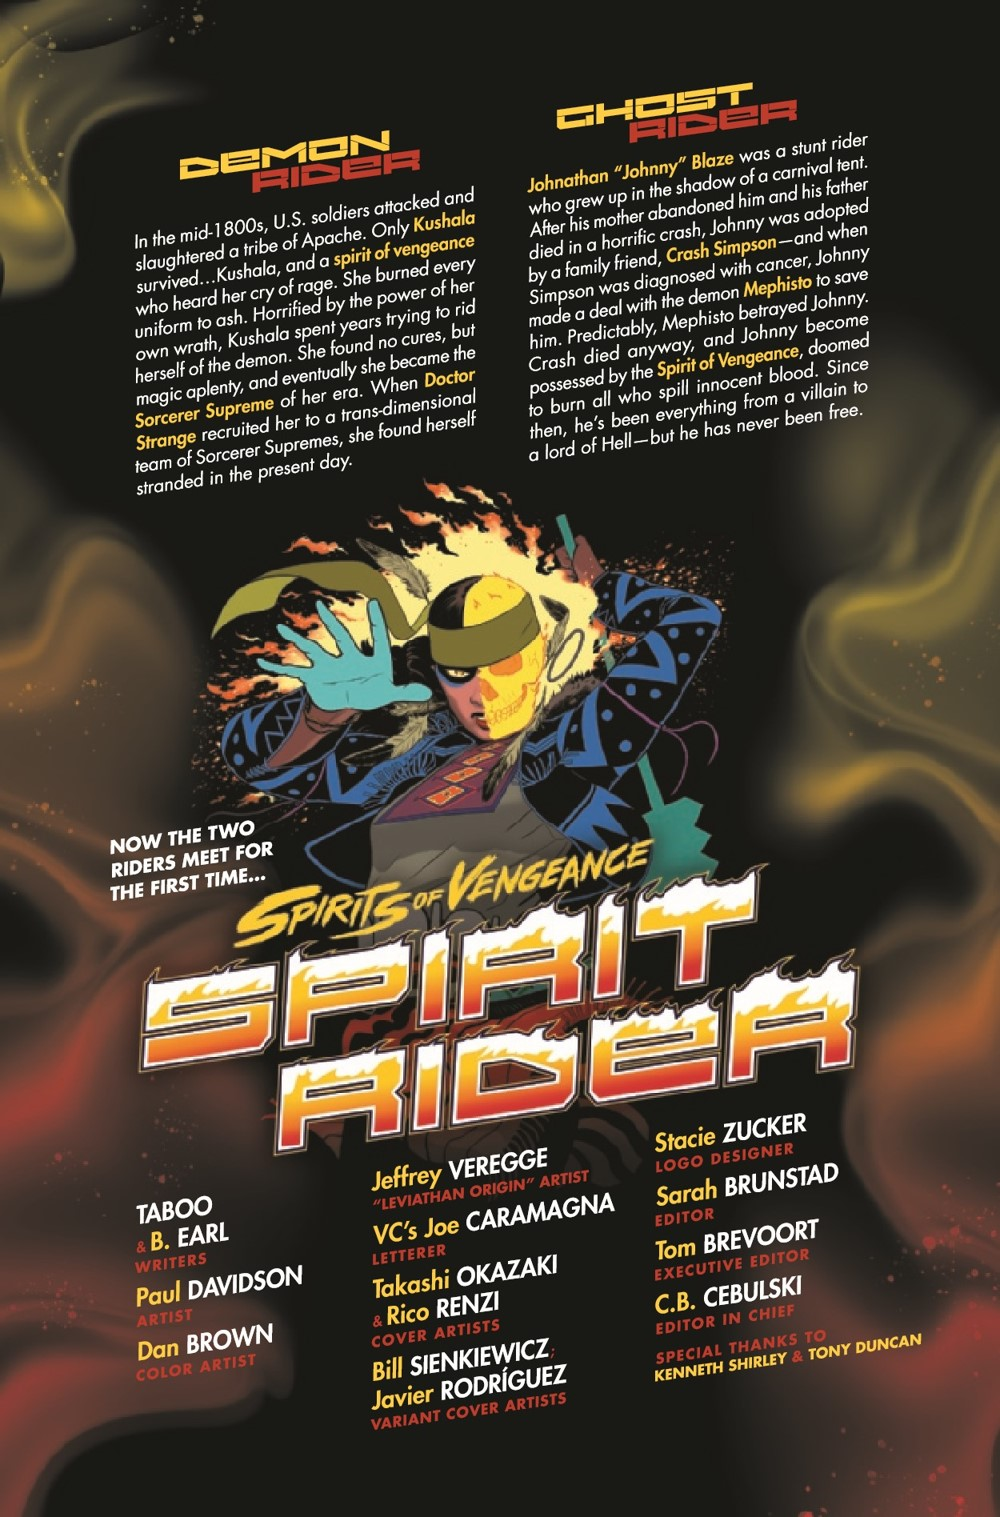 SOVSPRIDER2021001_Preview-2 ComicList Previews: SPIRITS OF VENGEANCE SPIRIT RIDER #1